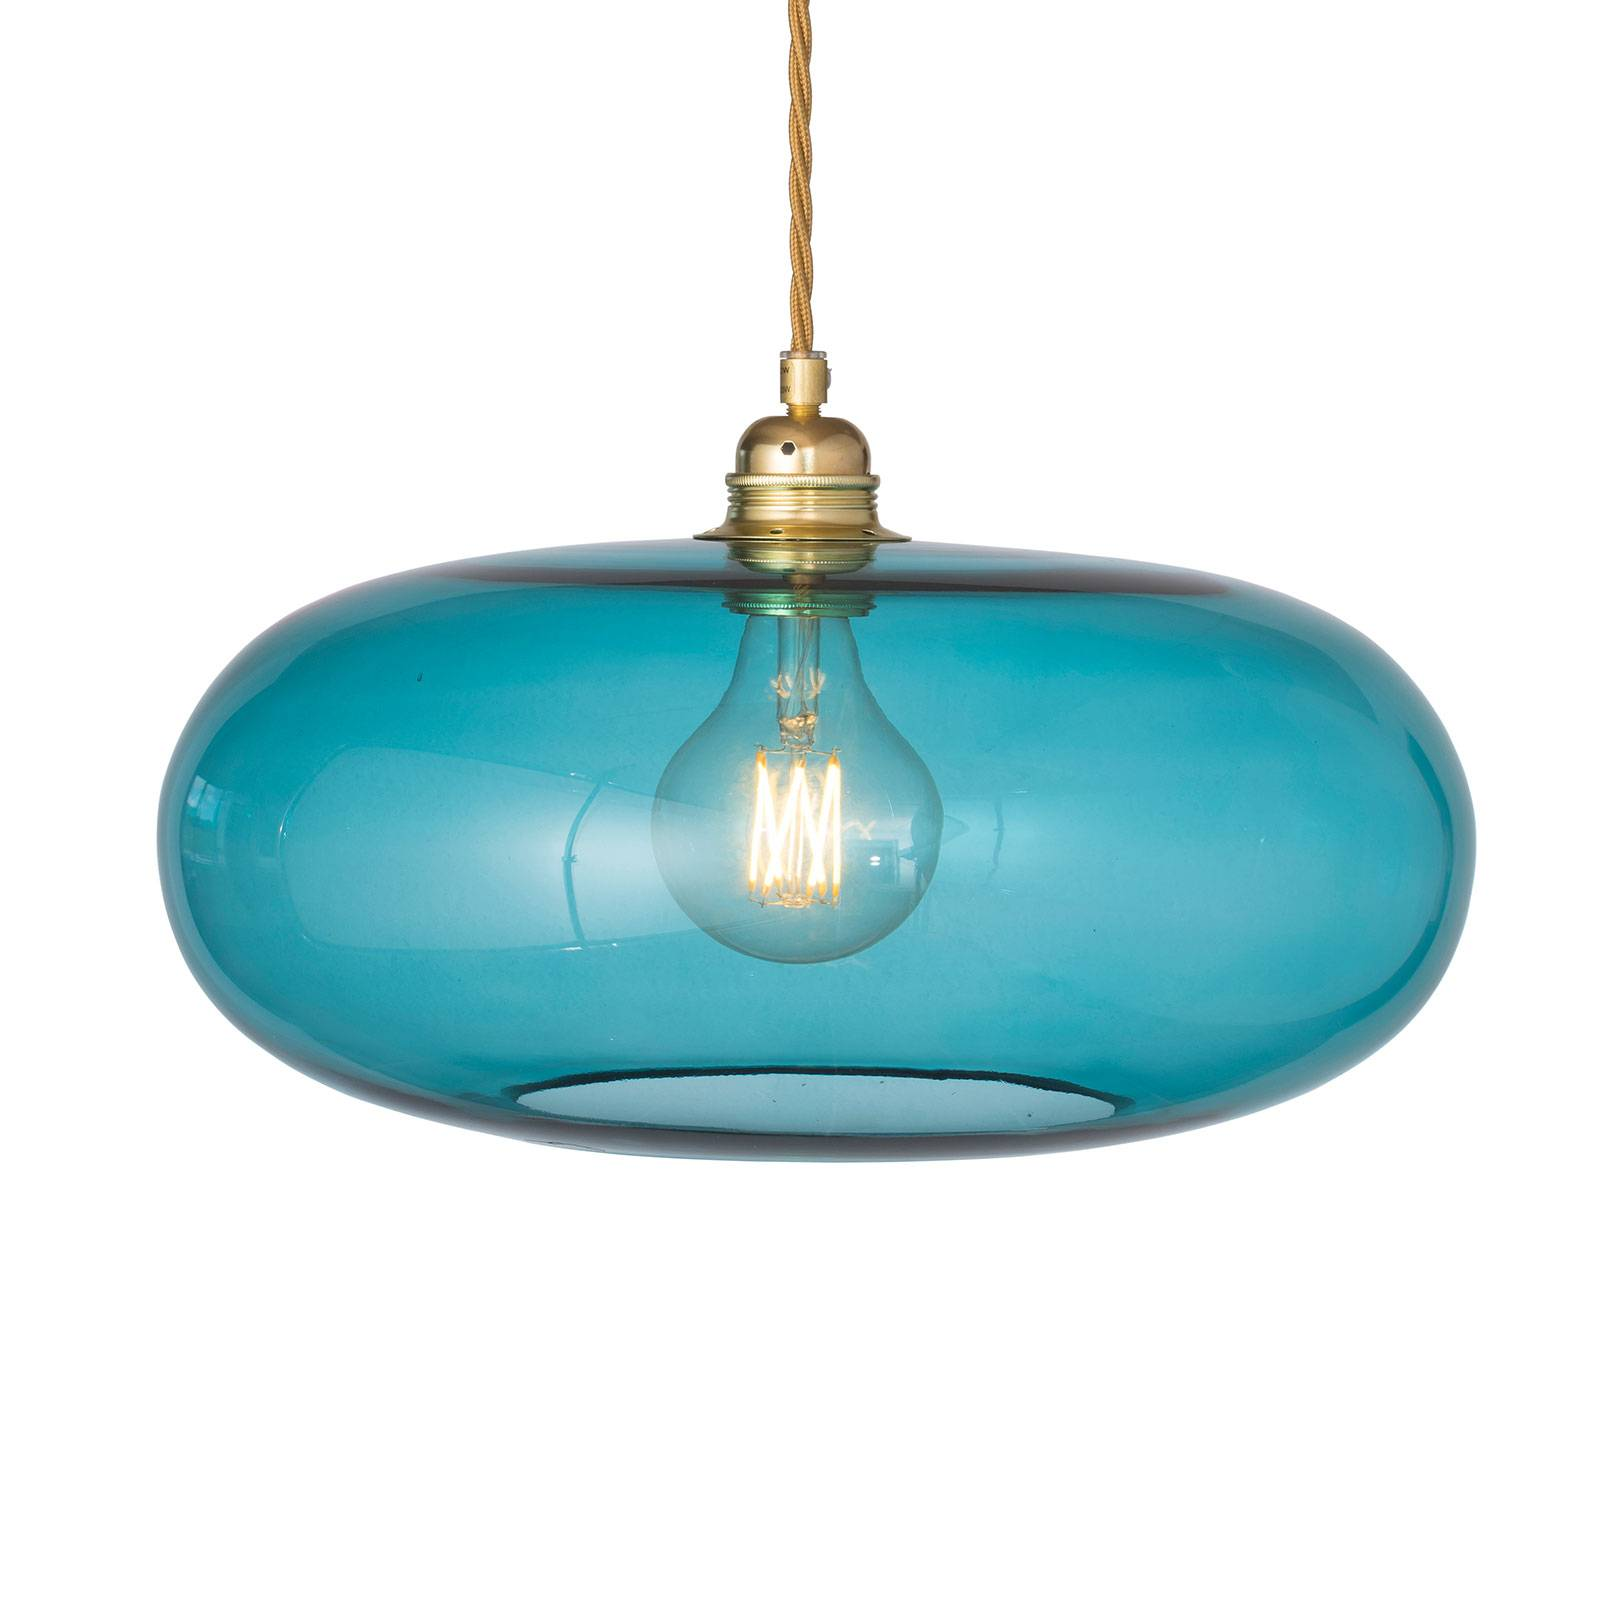 EBB & FLOW Horizon hanglamp zeeblauw Ø 36cm